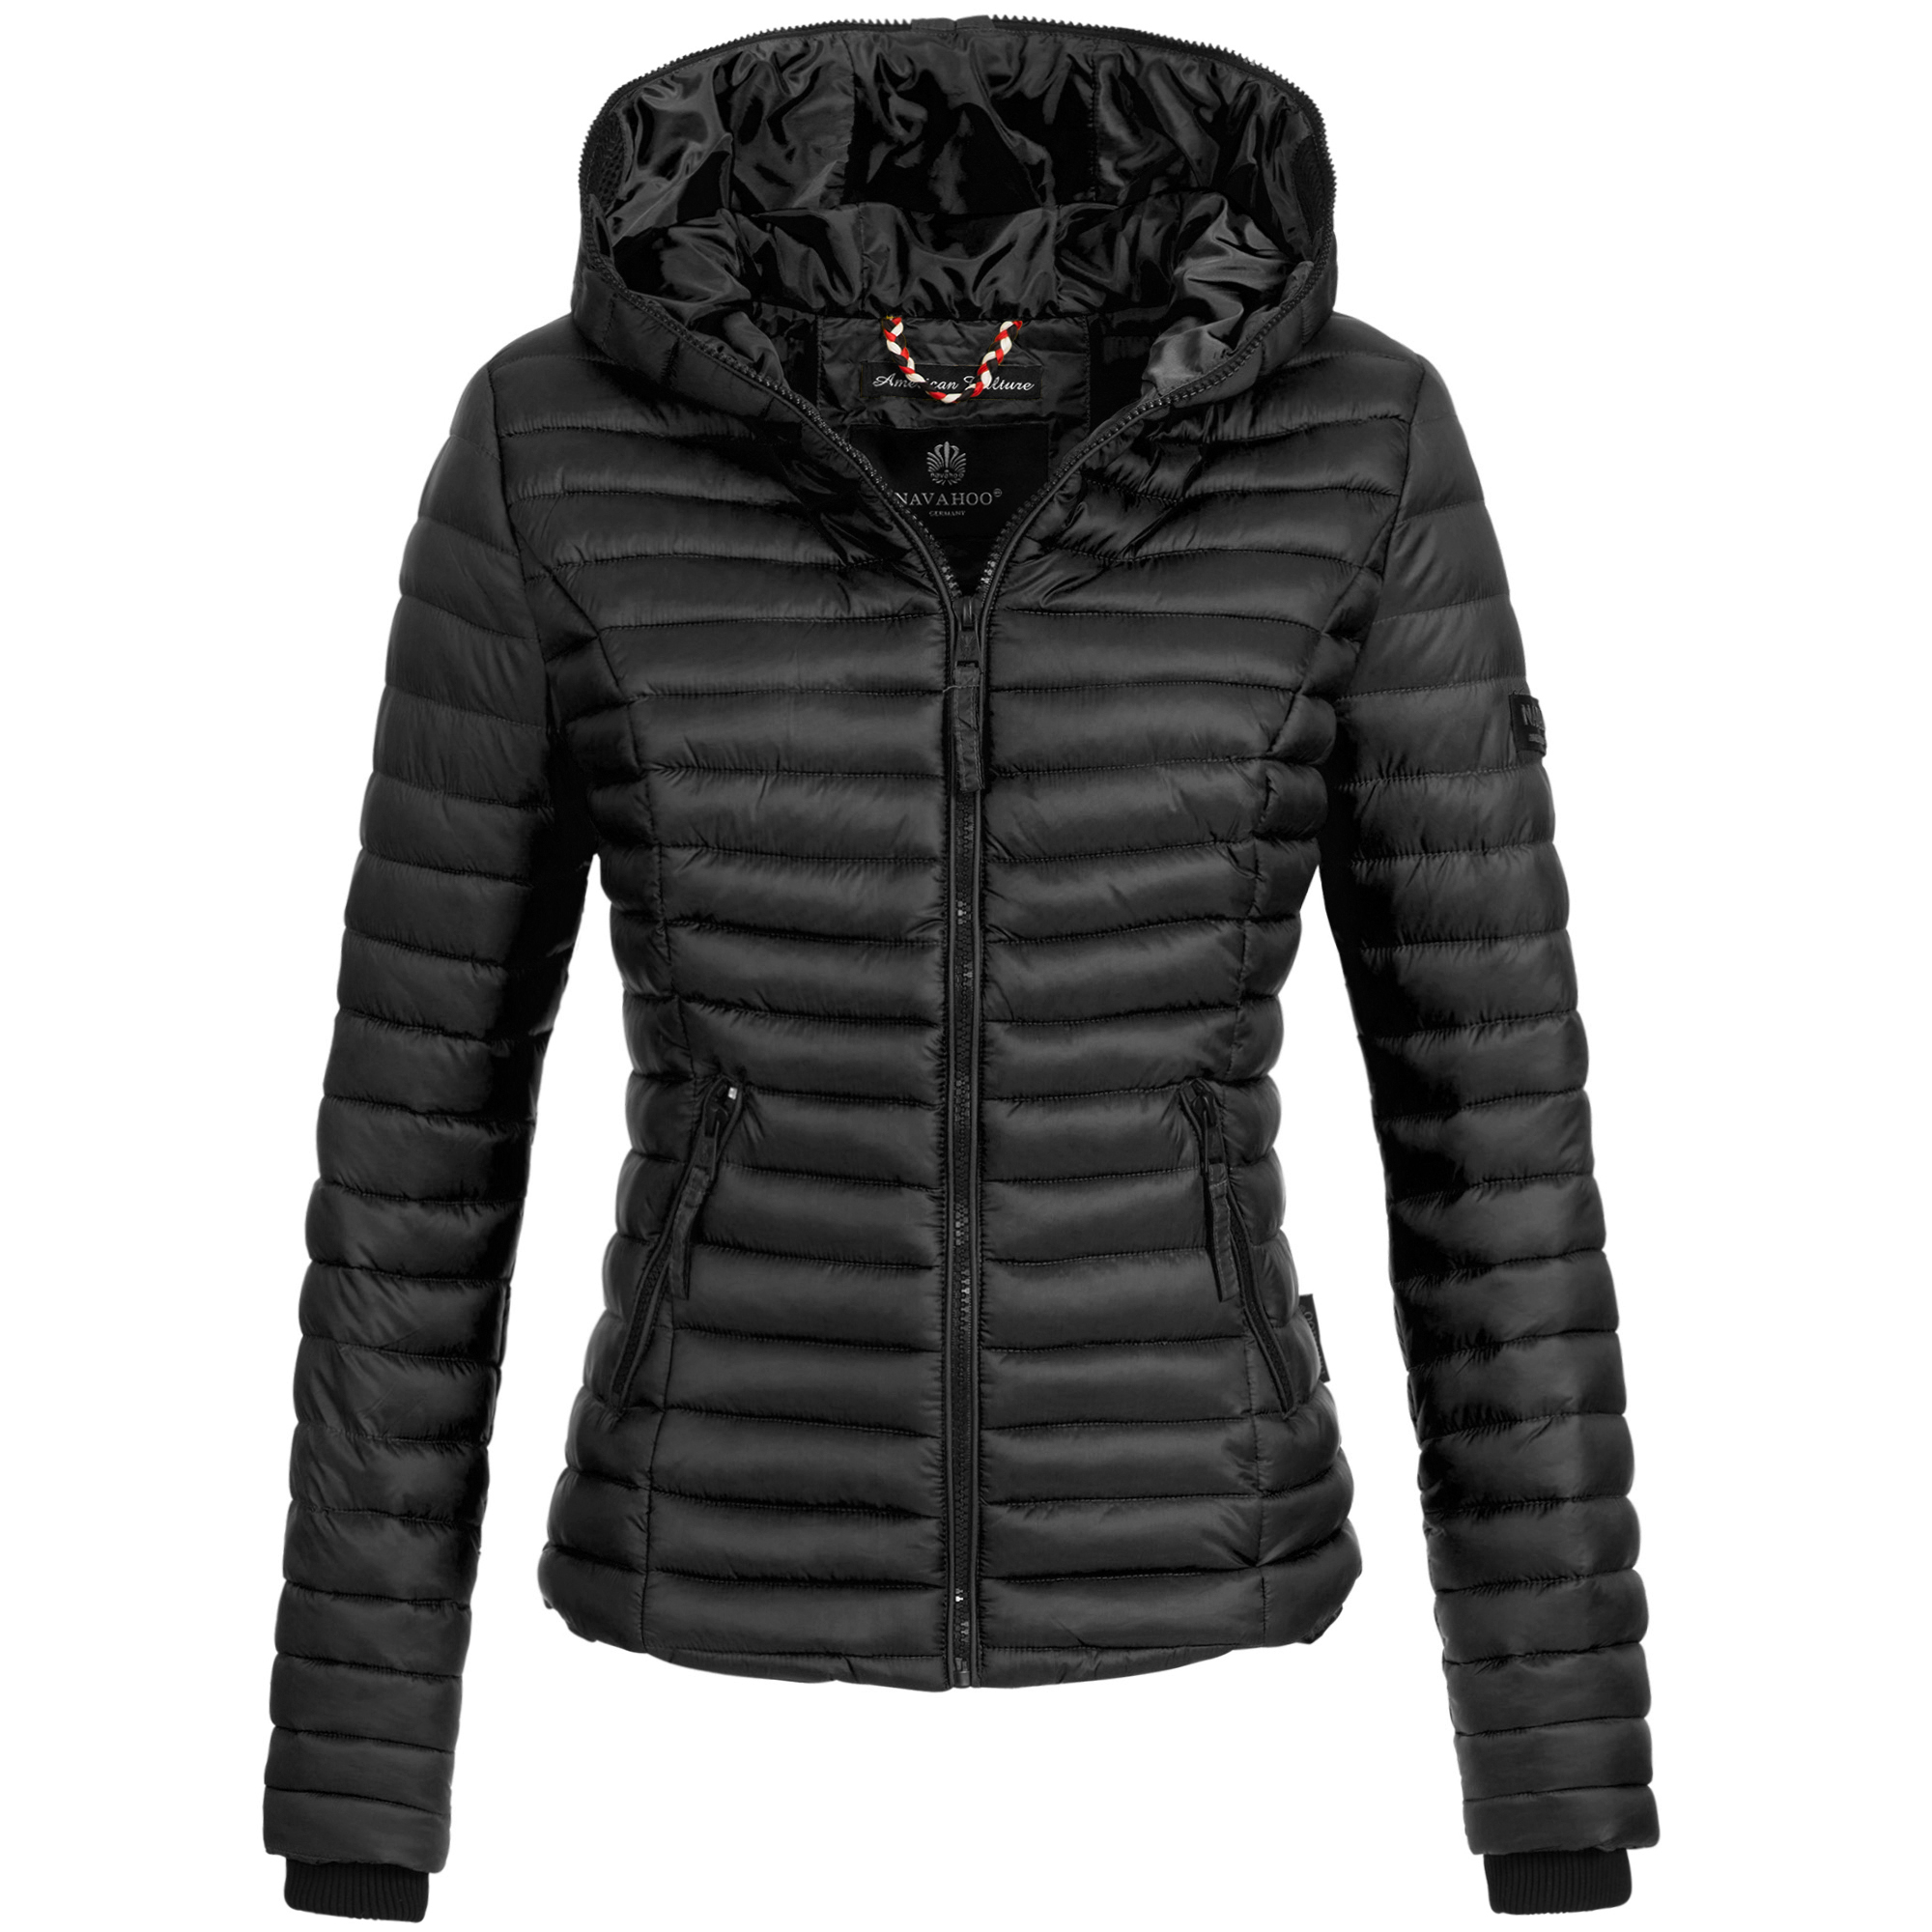 buy popular 49cd6 05e70 Navahoo KIMUK Damen Jacke Steppjacke Übergangsjacke Kapuze gesteppt XS-XXL